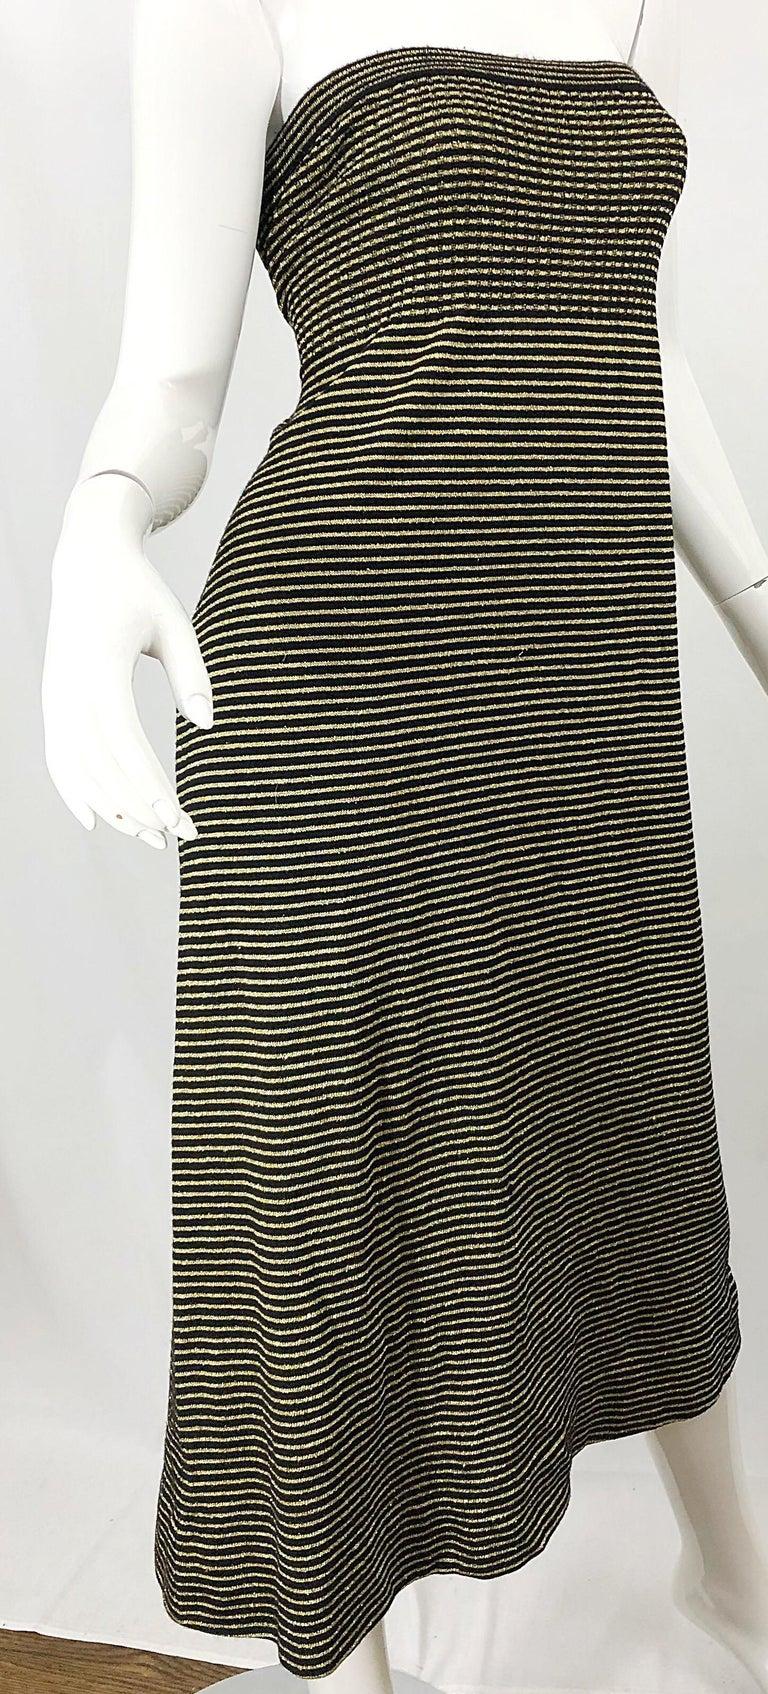 Vintage Yves Saint Laurent YSL 70s Gold Black Strapless Knit Dress or Maxi Skirt For Sale 5